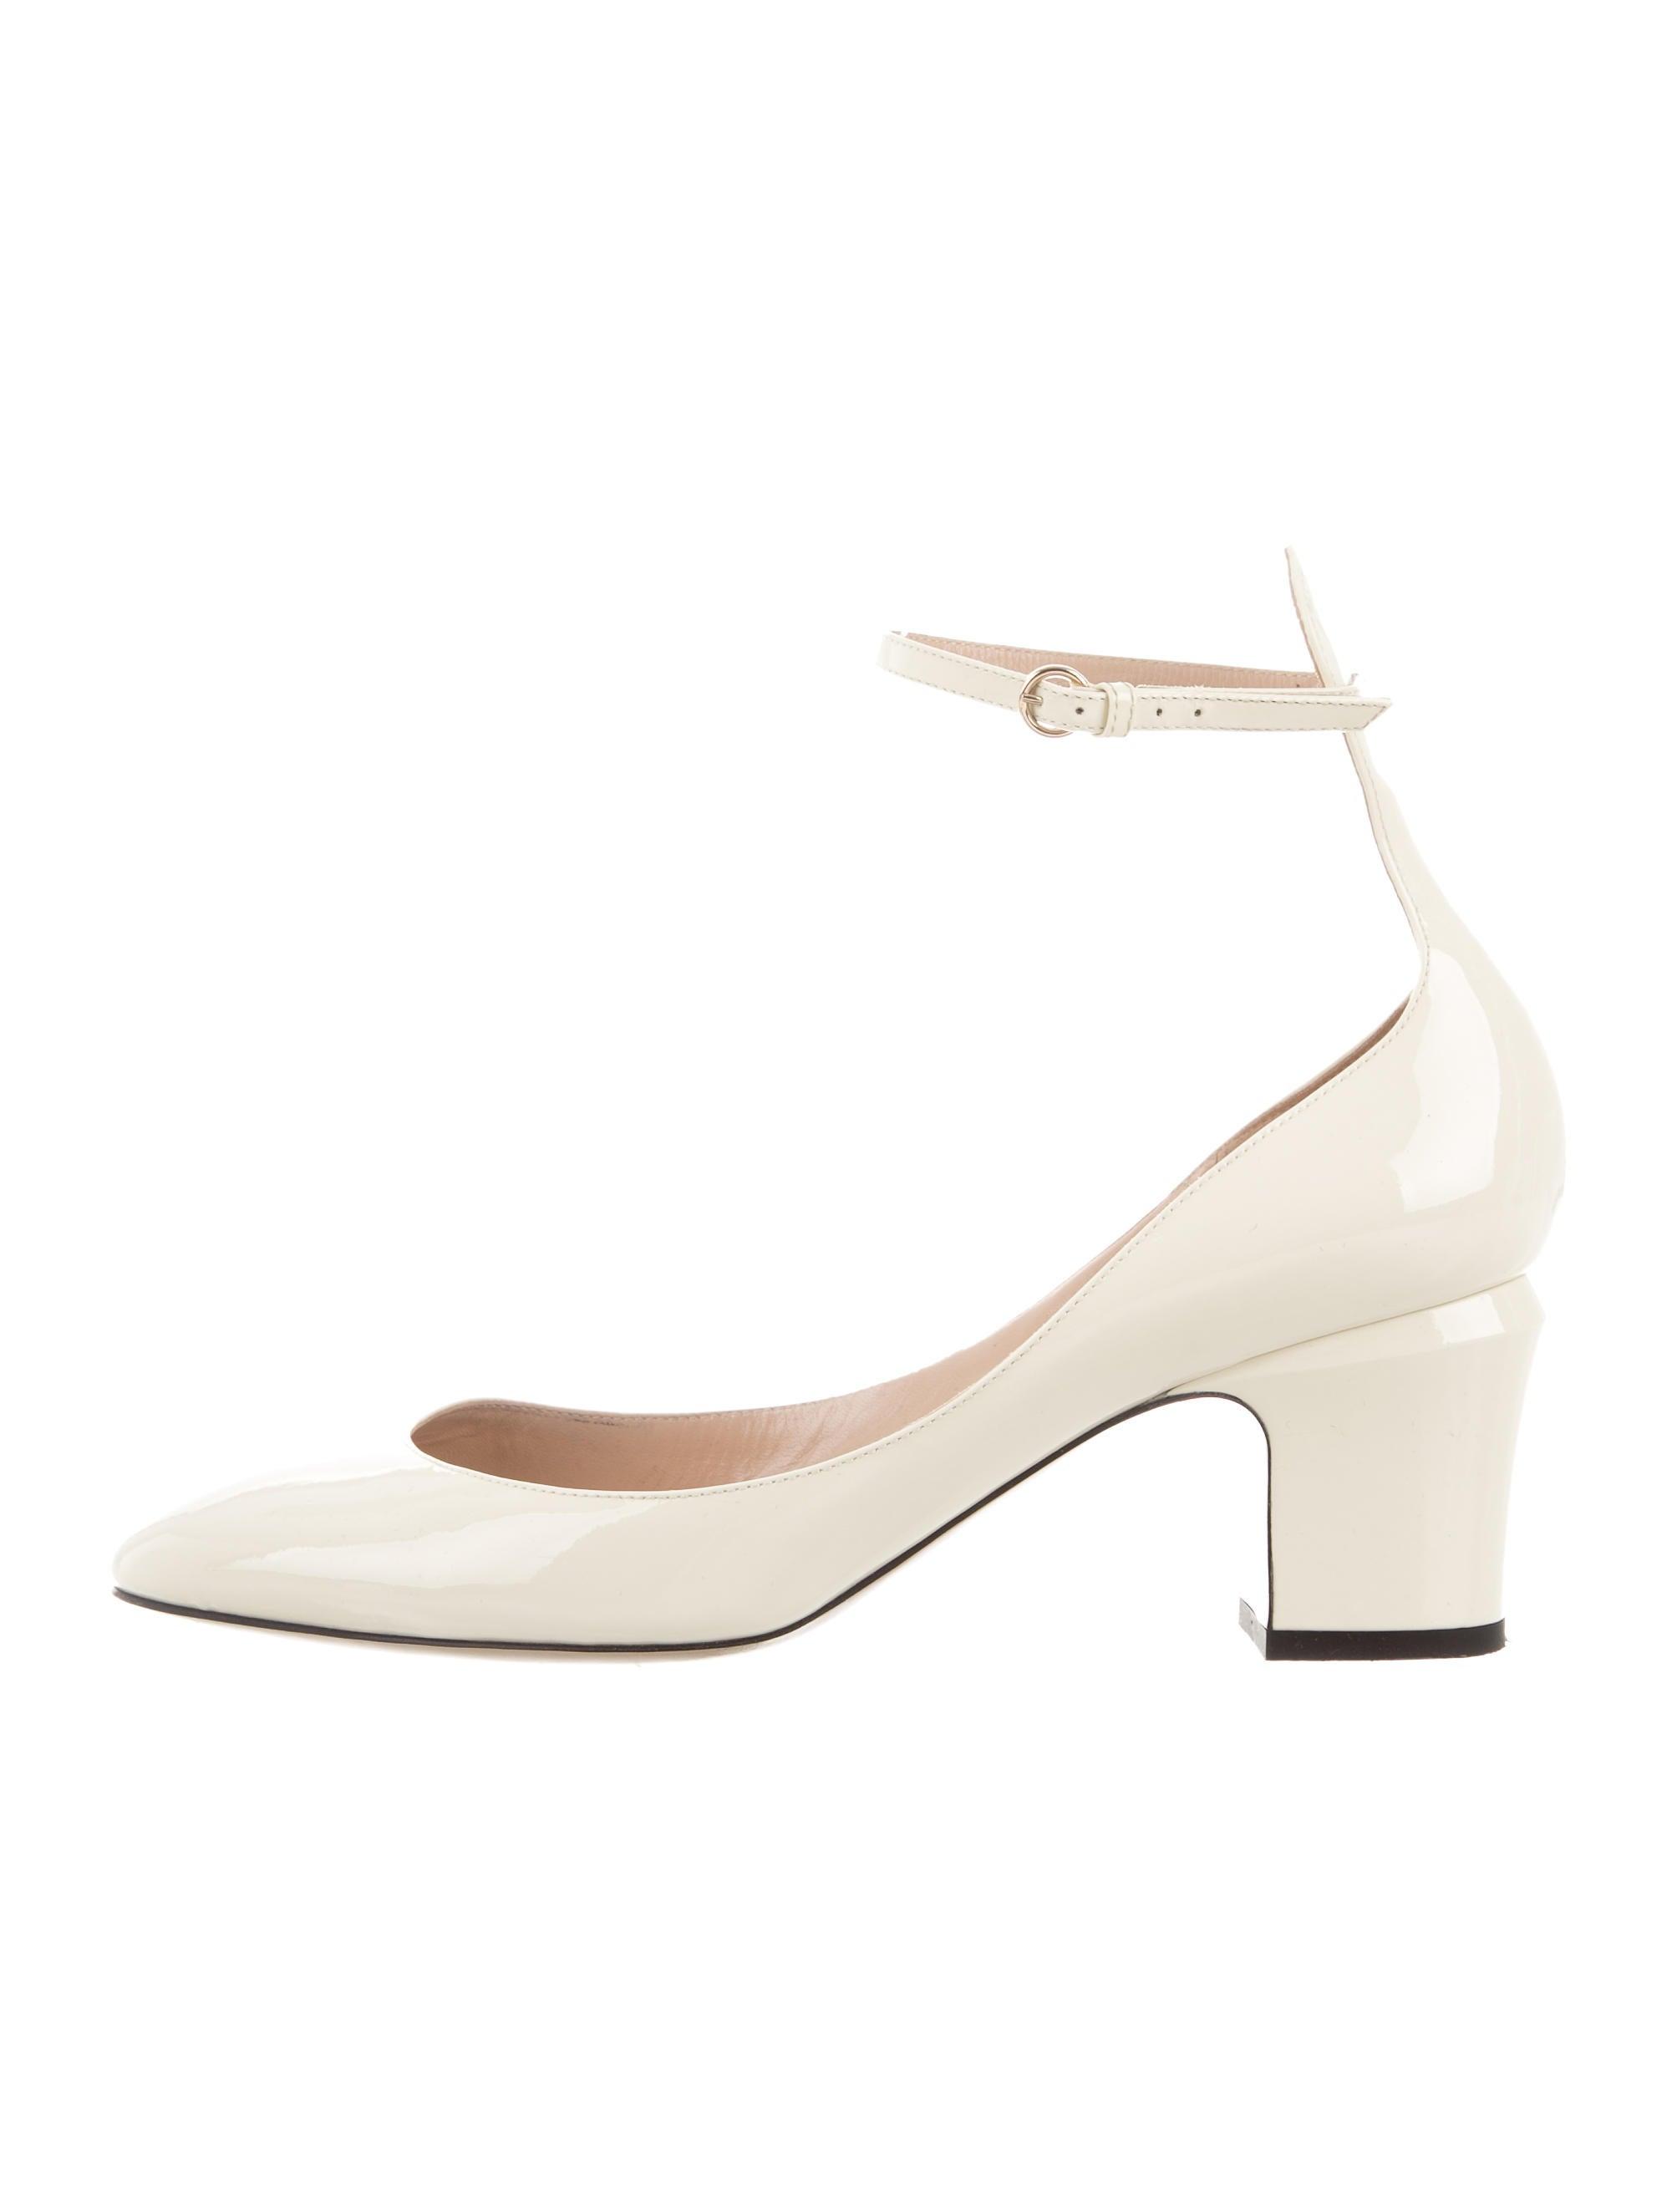 4326fa80a8f8 Valentino Tango Ankle-Strap Pumps - Shoes - VAL62596